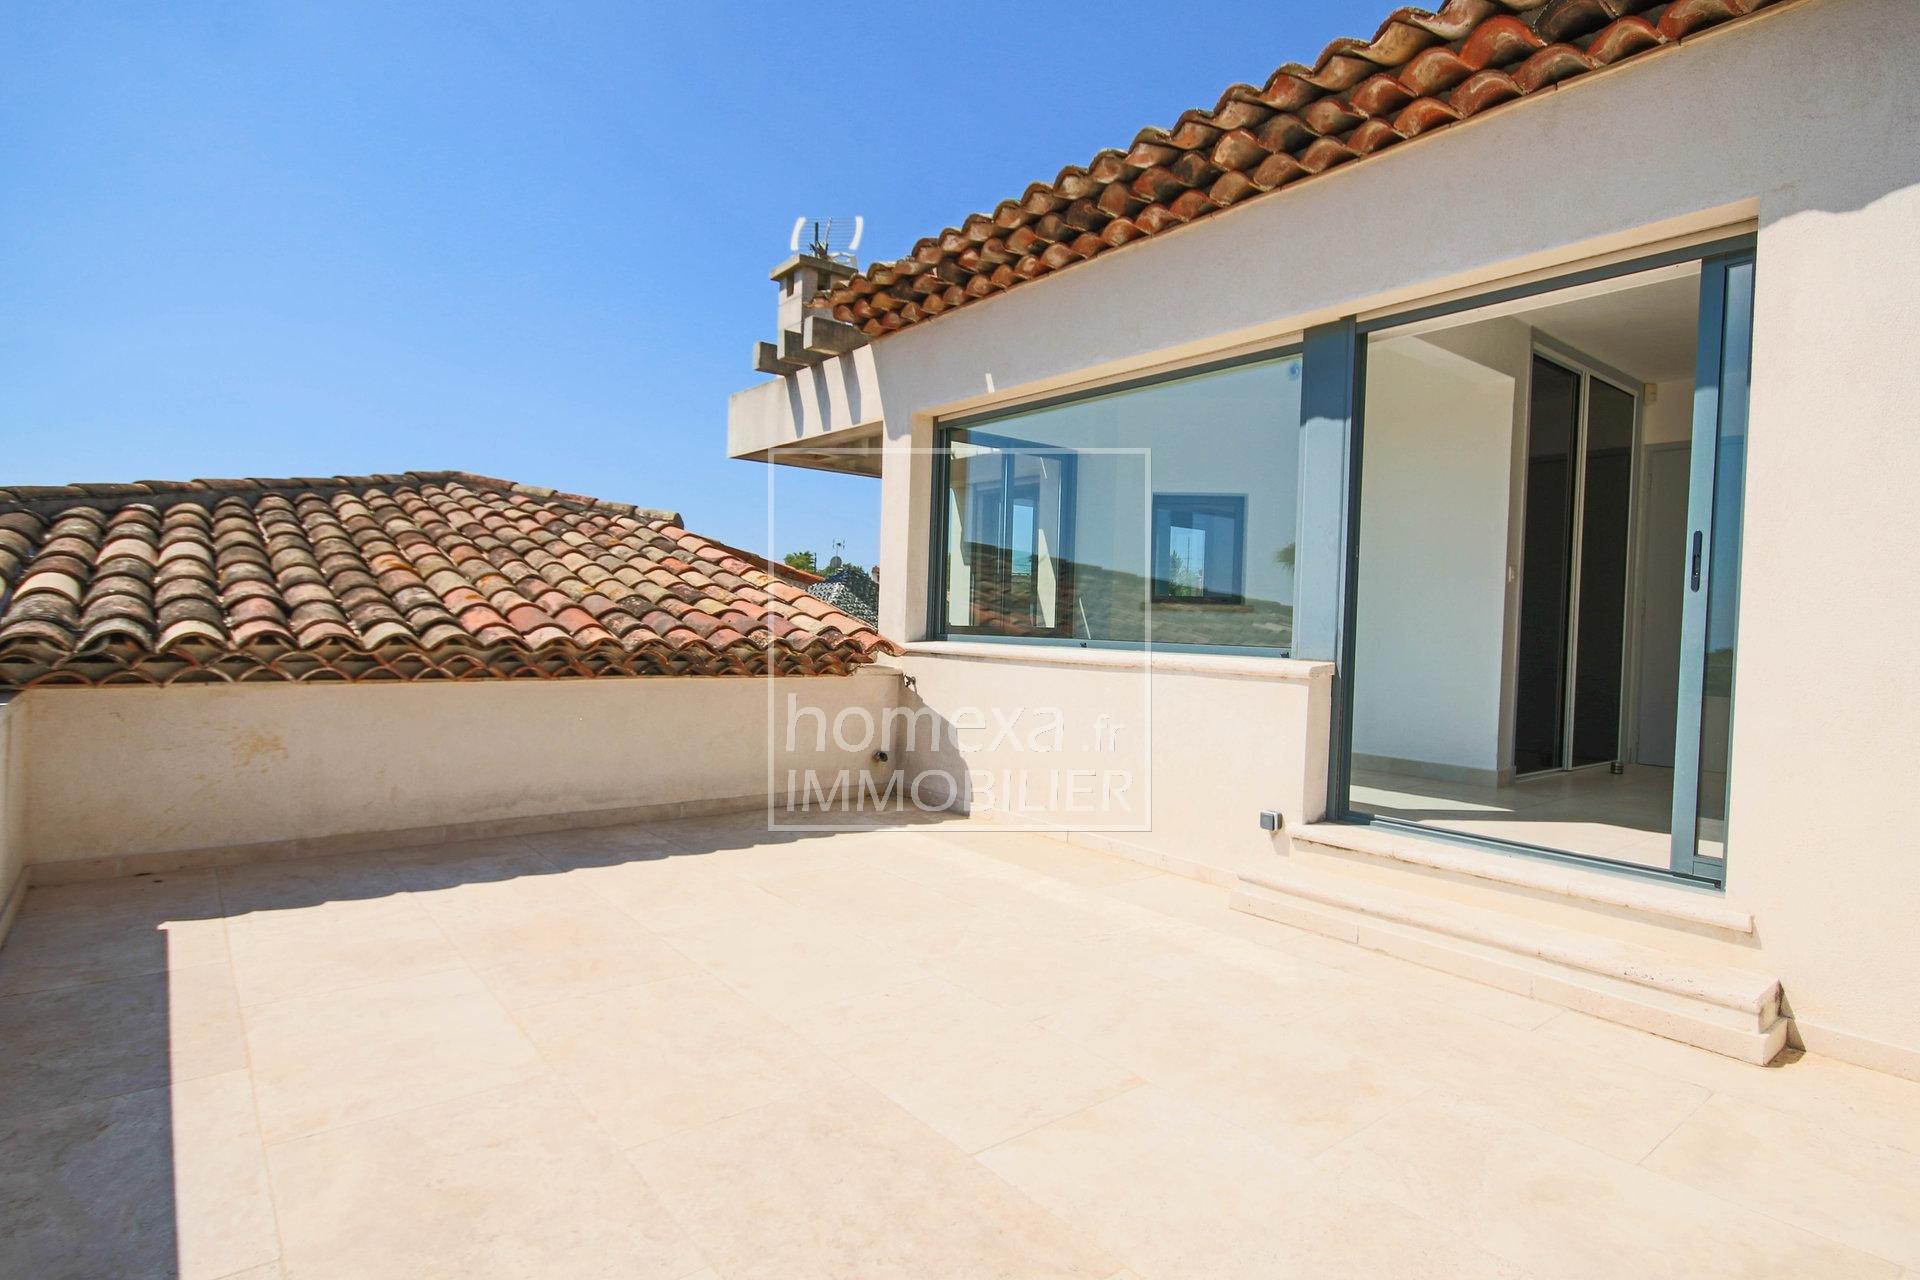 Vente Villa contemporaine Antibes vue mer